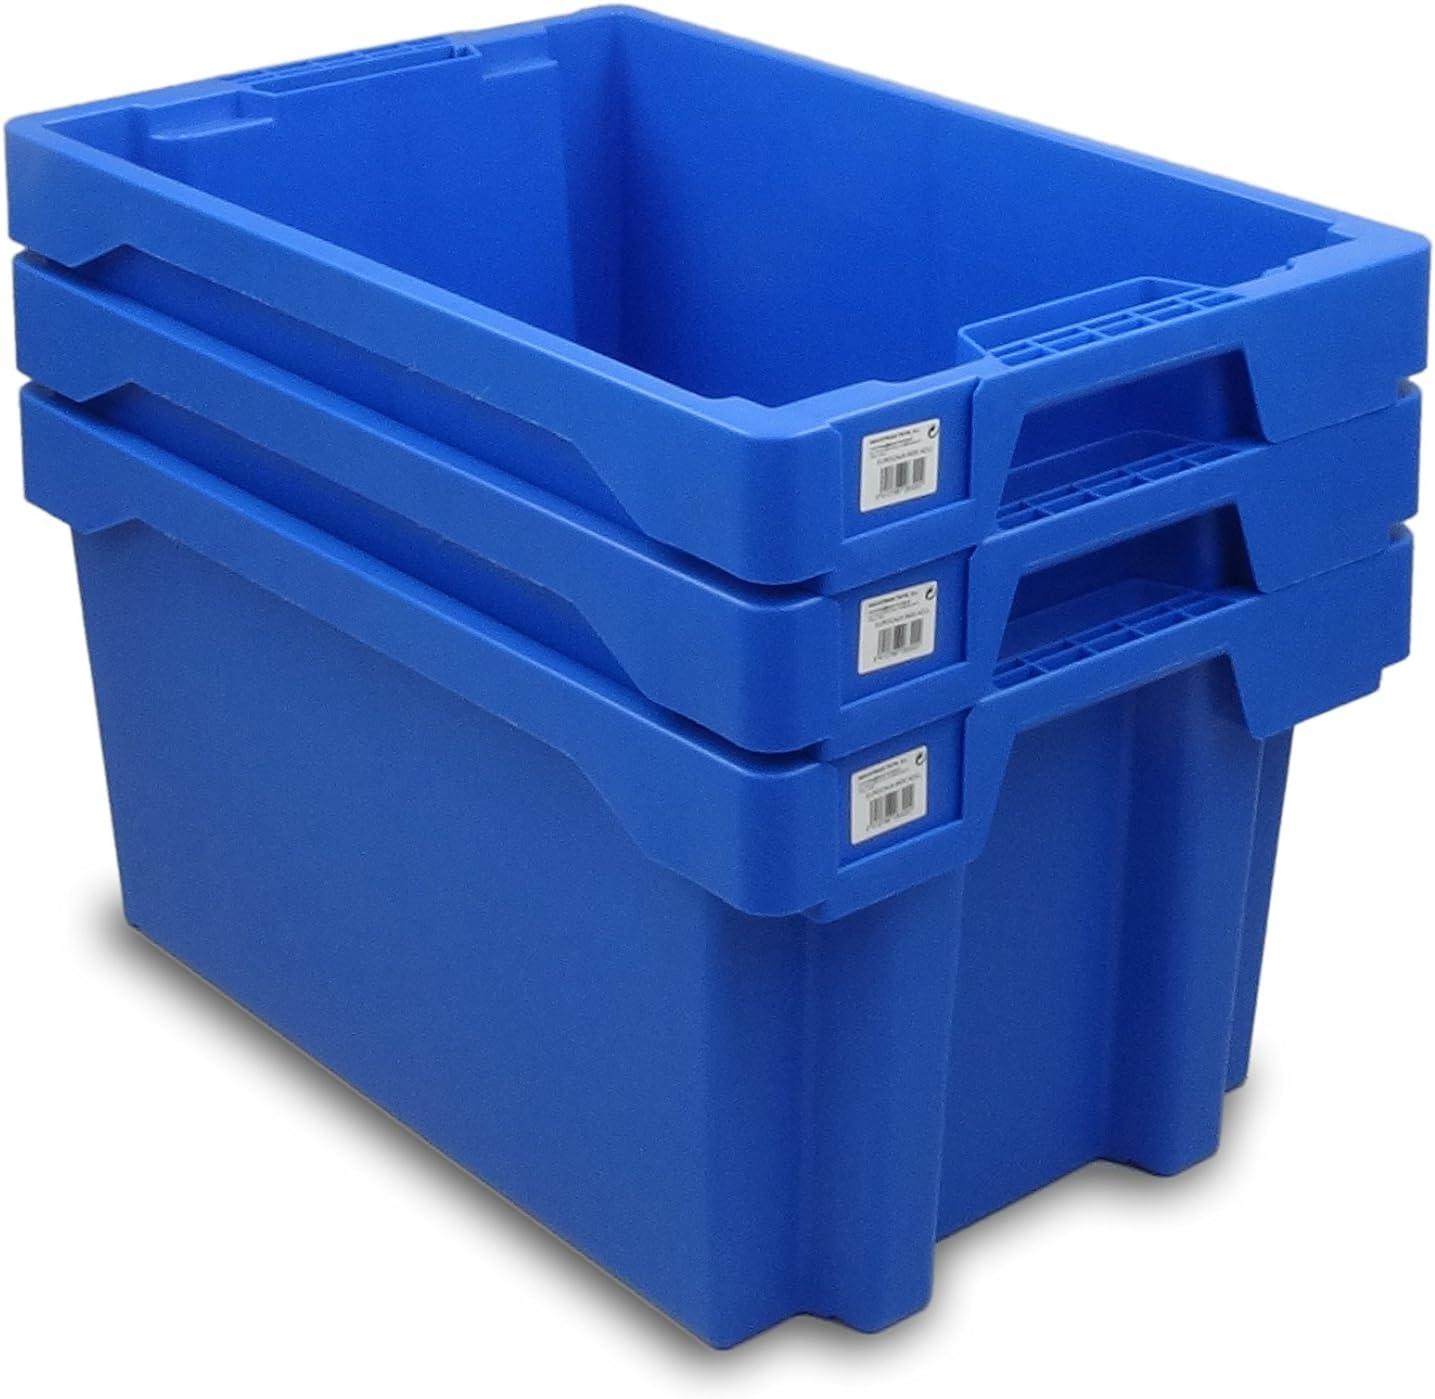 Tayg Euro-caja para almacén y transporte 6430, Azul, 600 x 400 x ...